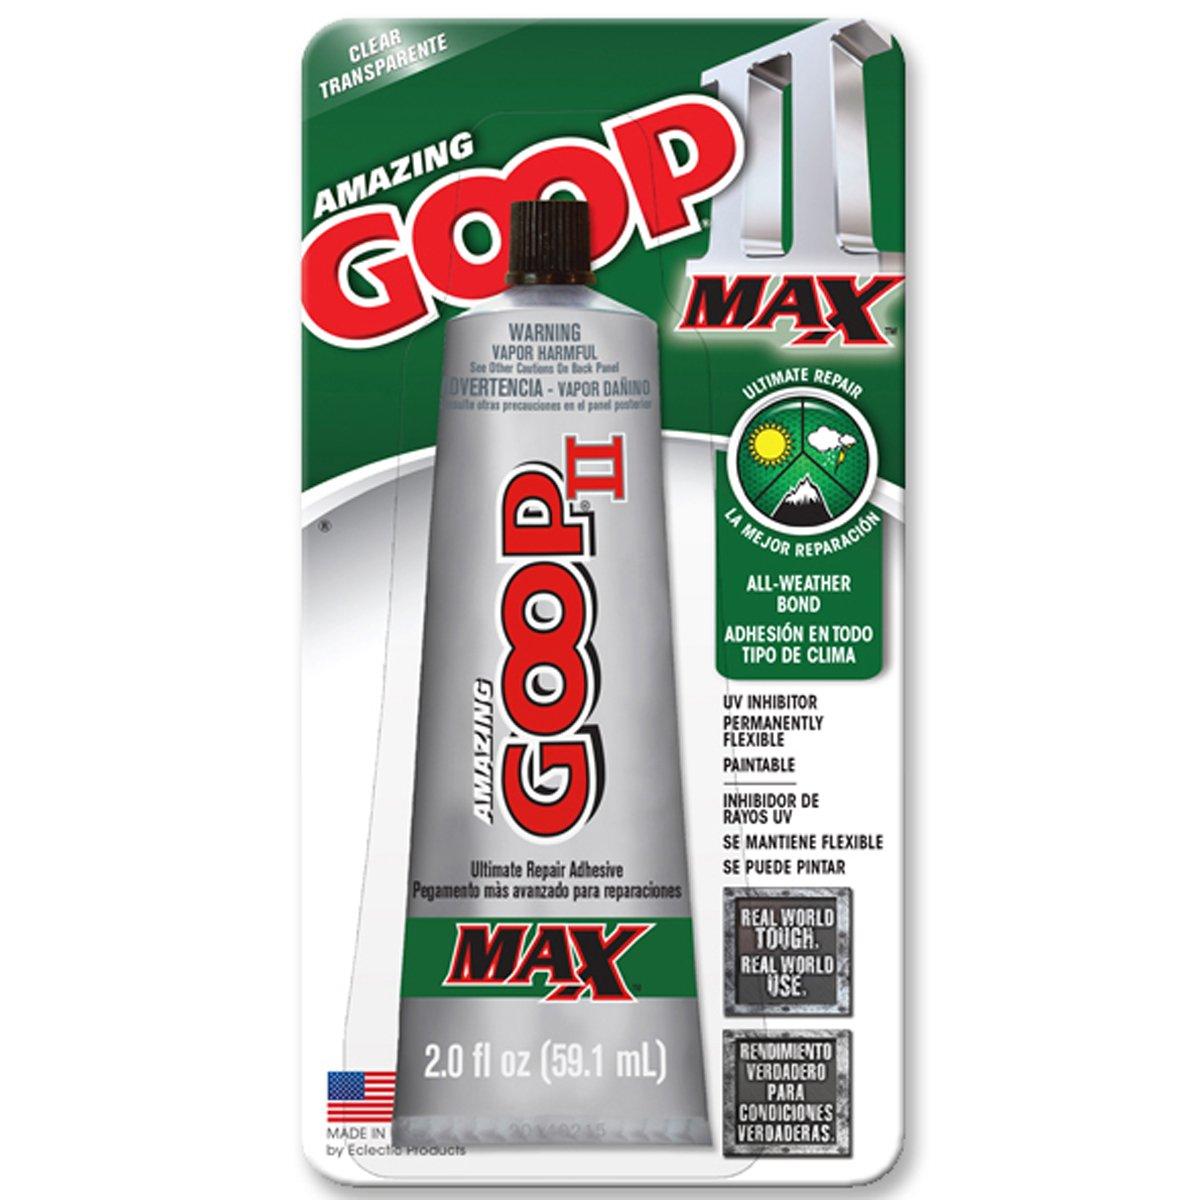 Amazing Goop II Max Glue - 2.0 Oz 2 Pack